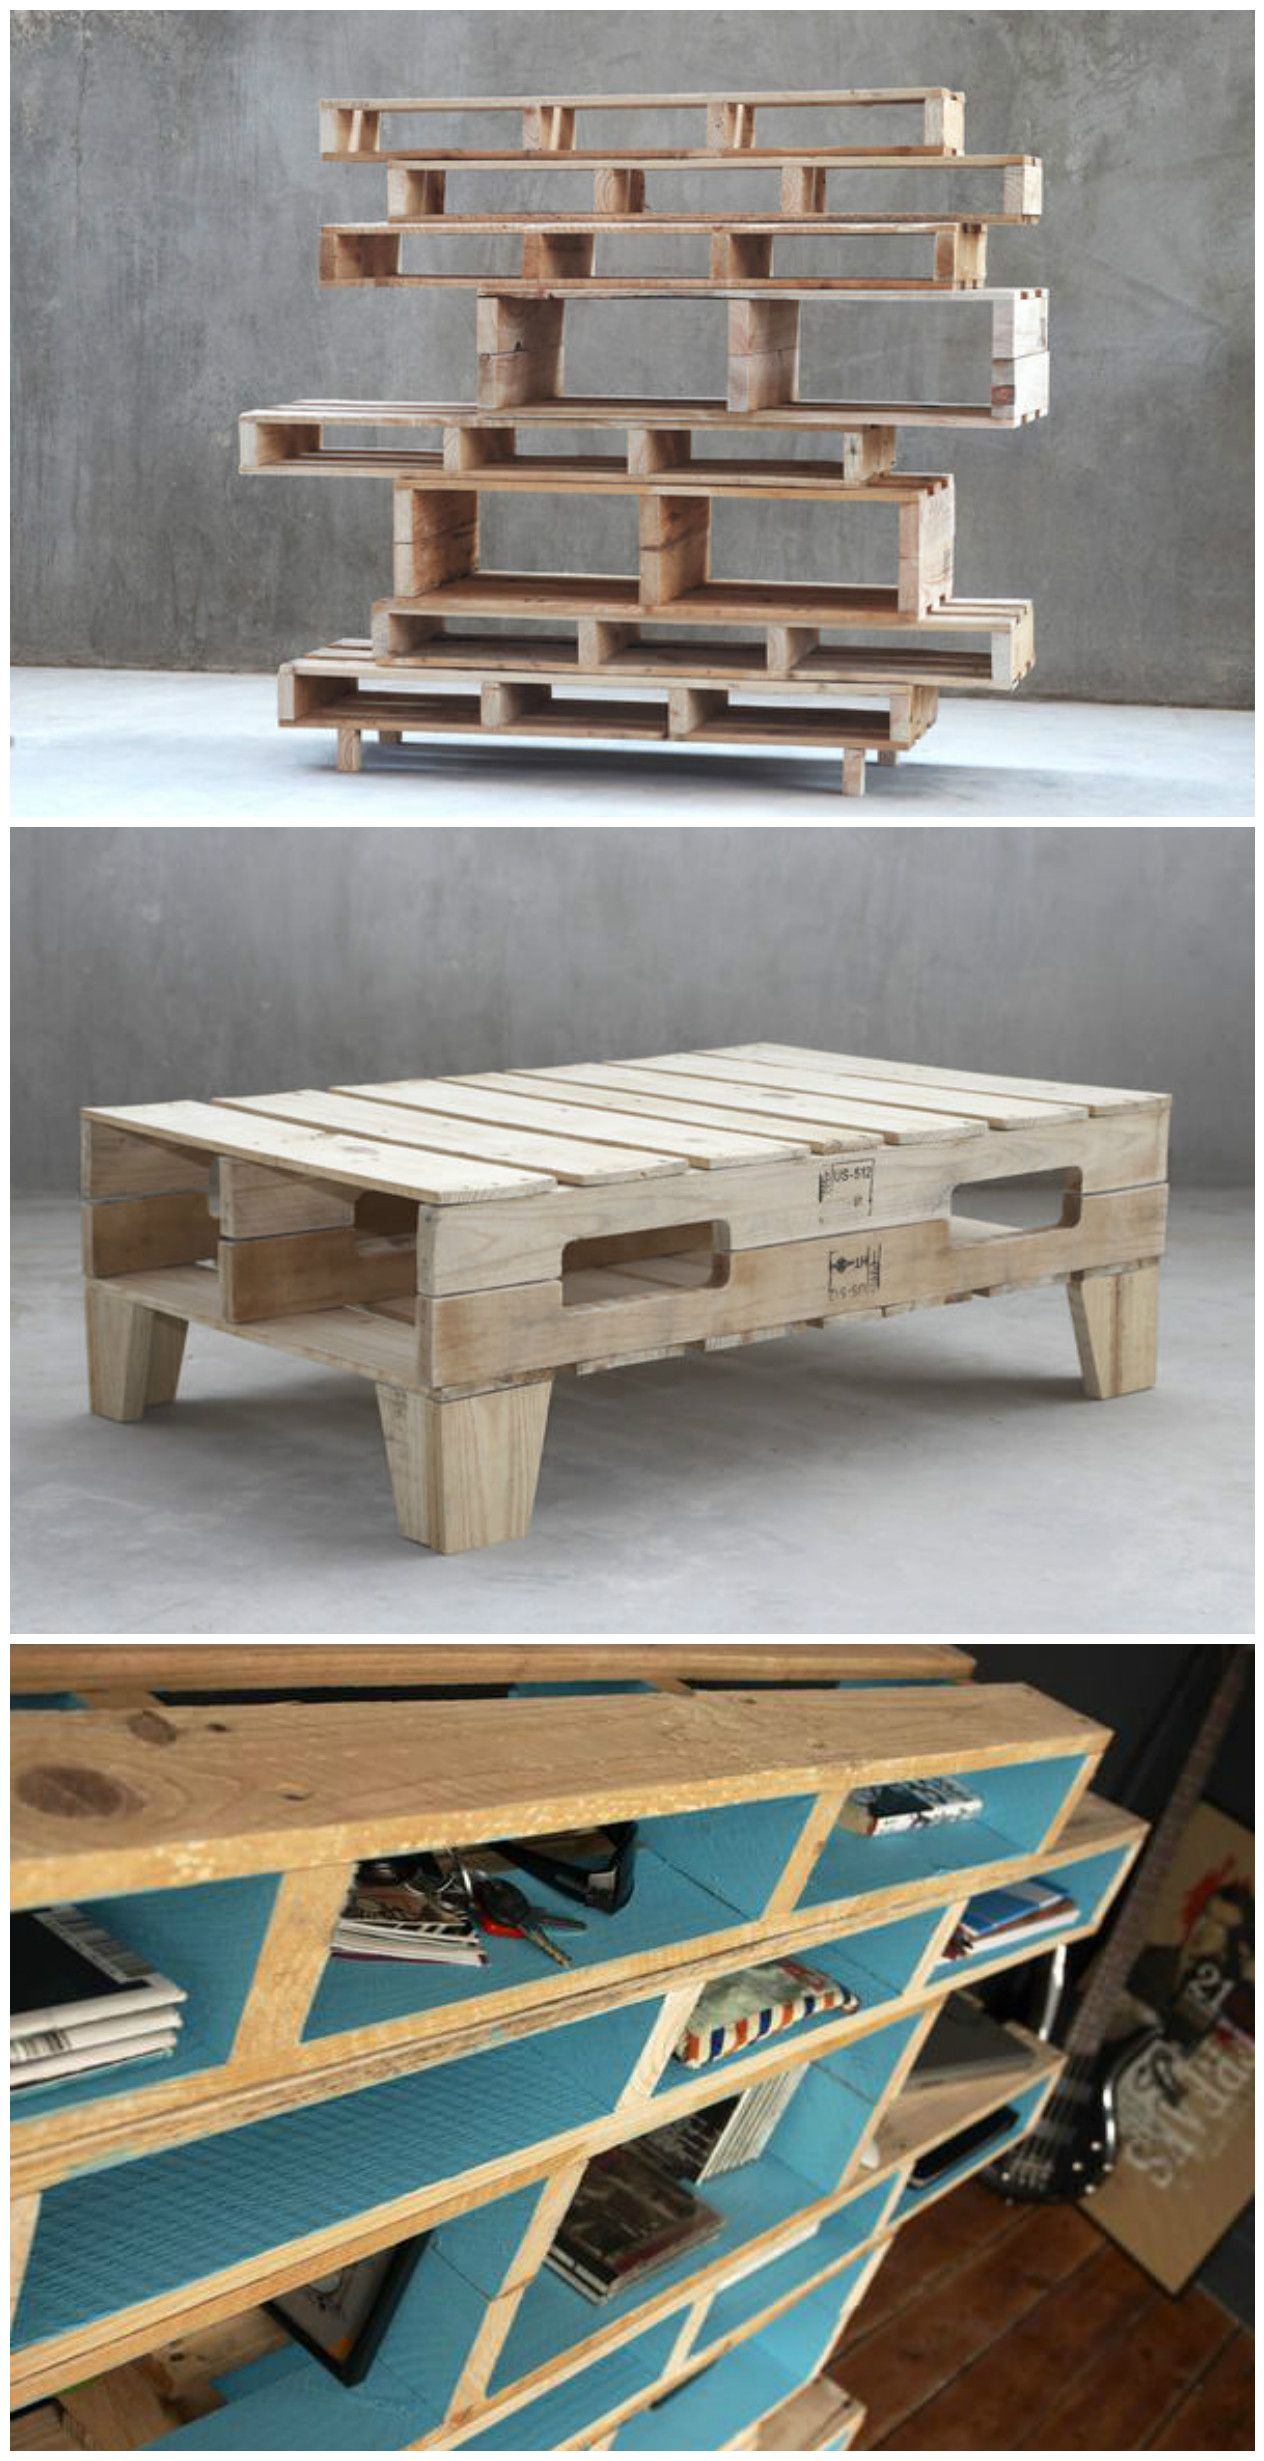 Pallet Shelves & Coffee Table By M&m Designers   Pinterest   Tarimas ...